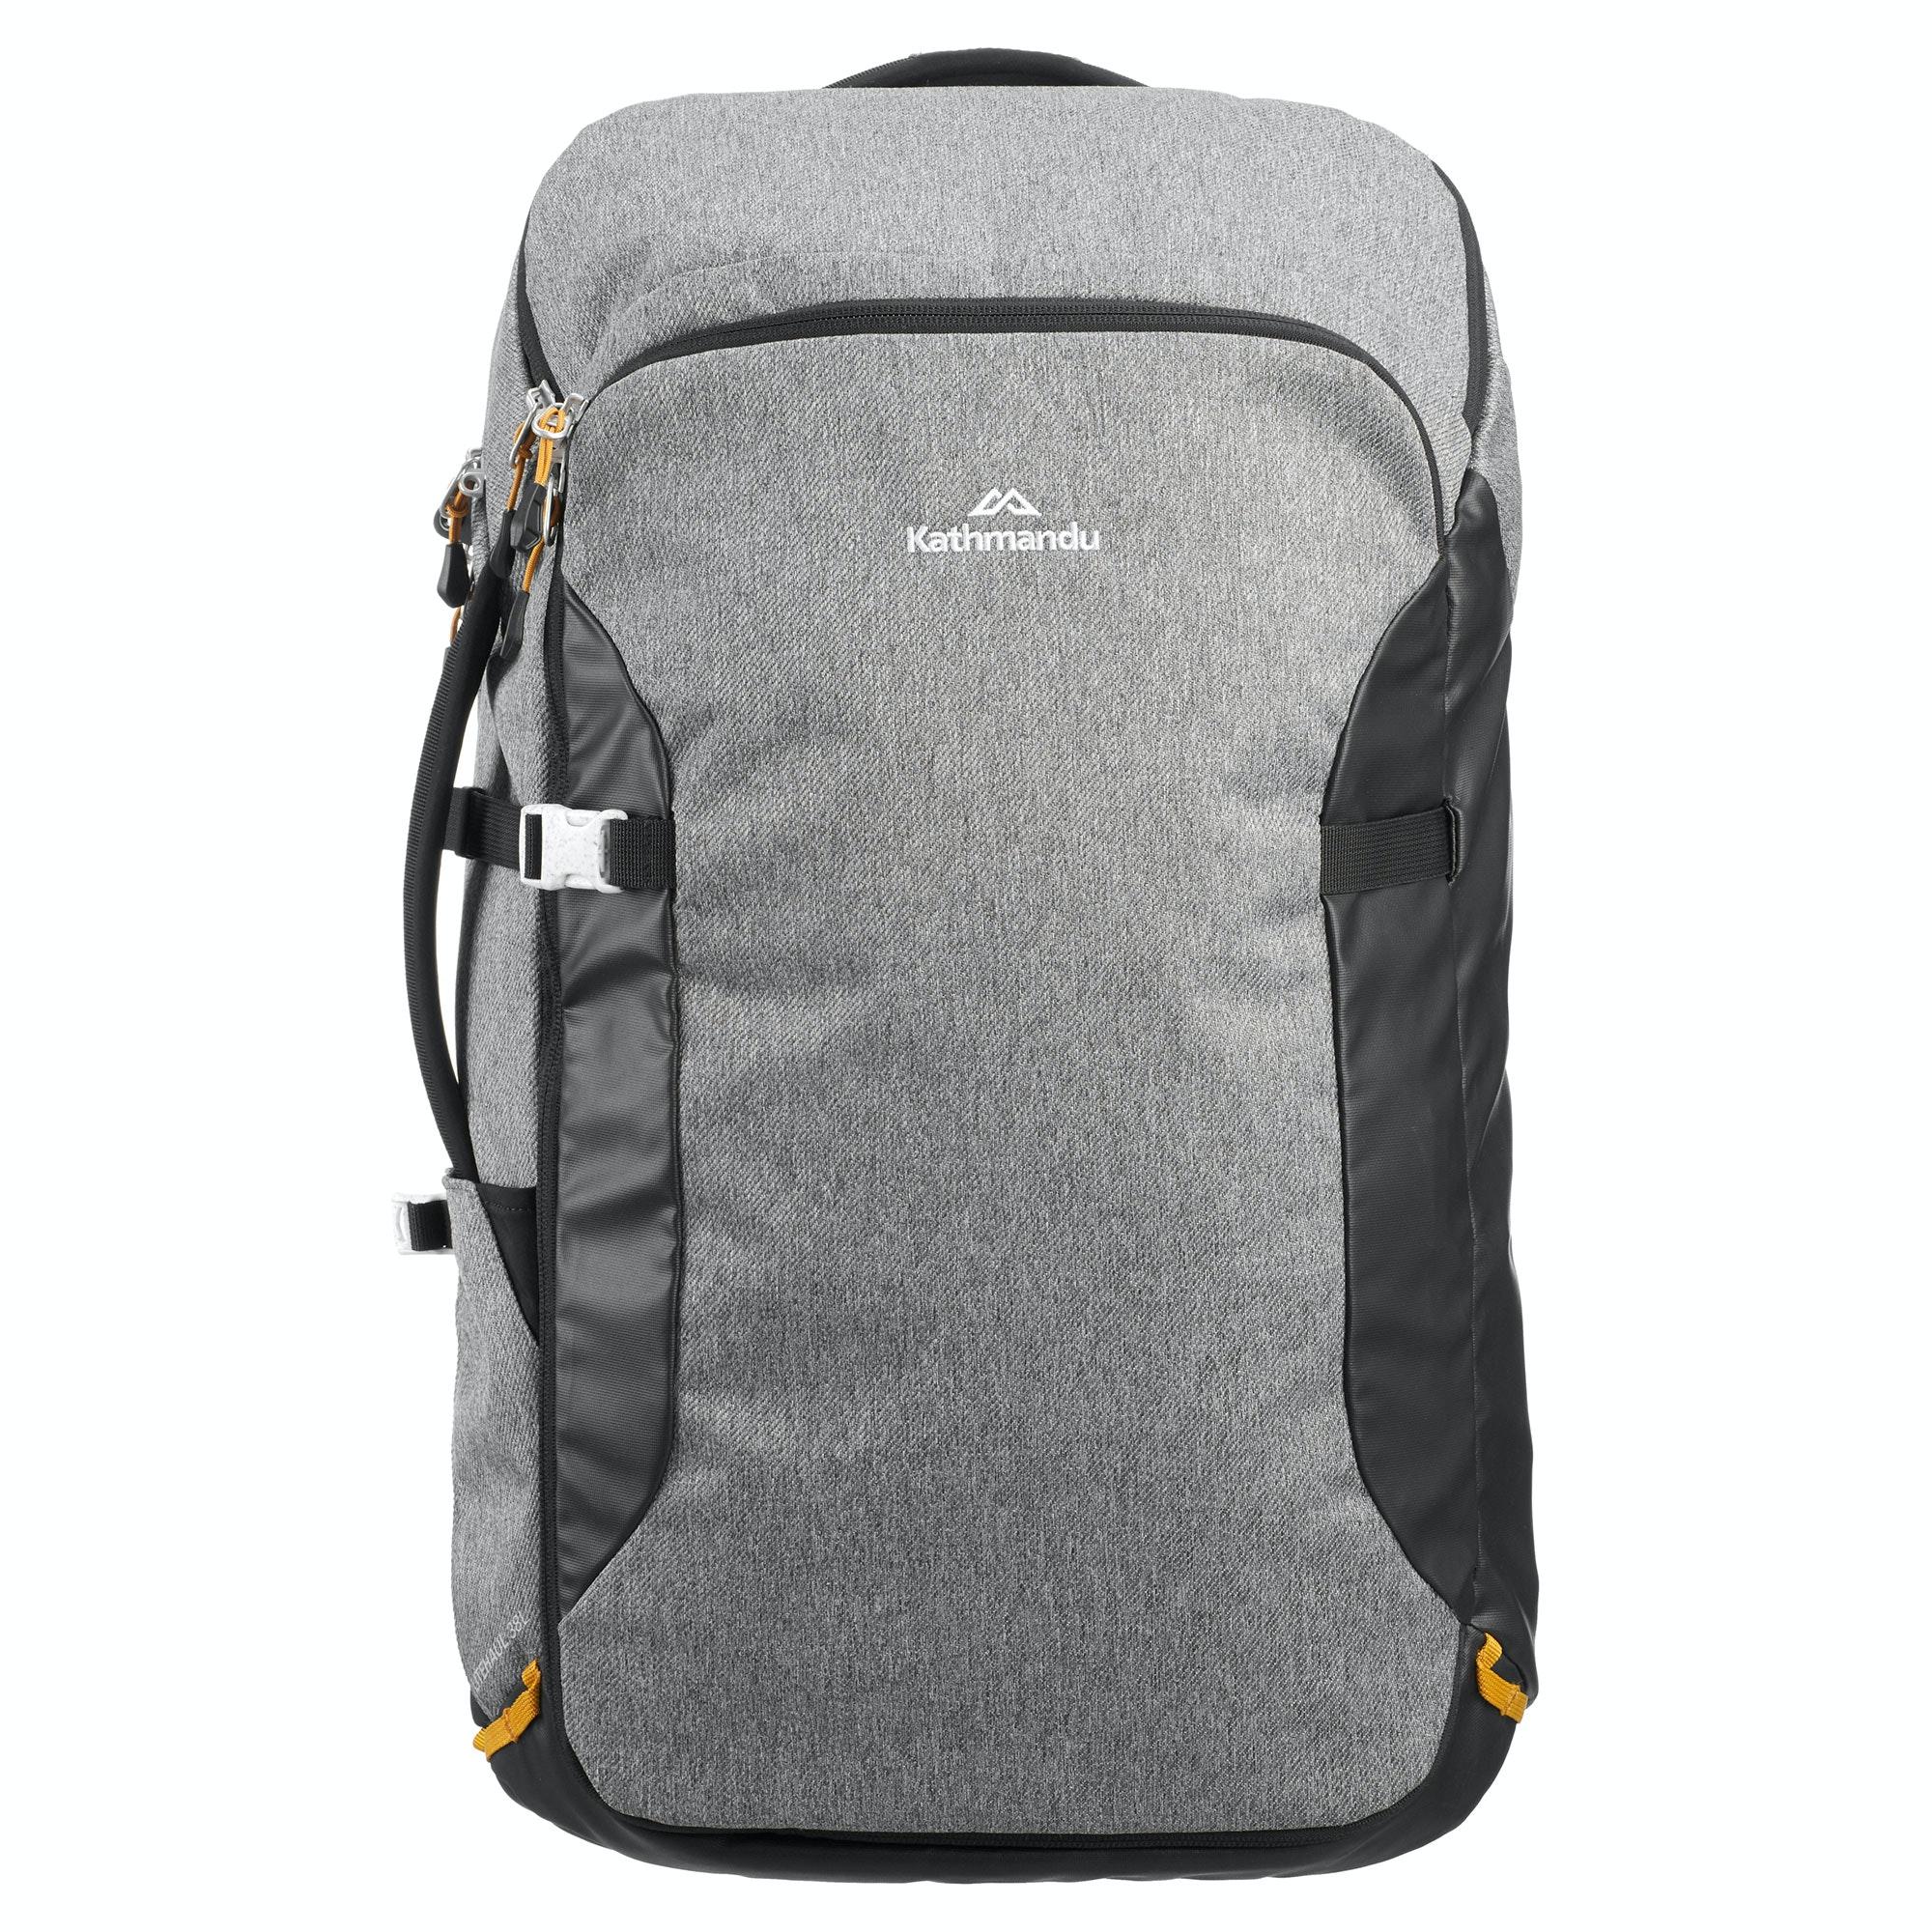 Bag - Kathmandu AU cb9072a355c6f